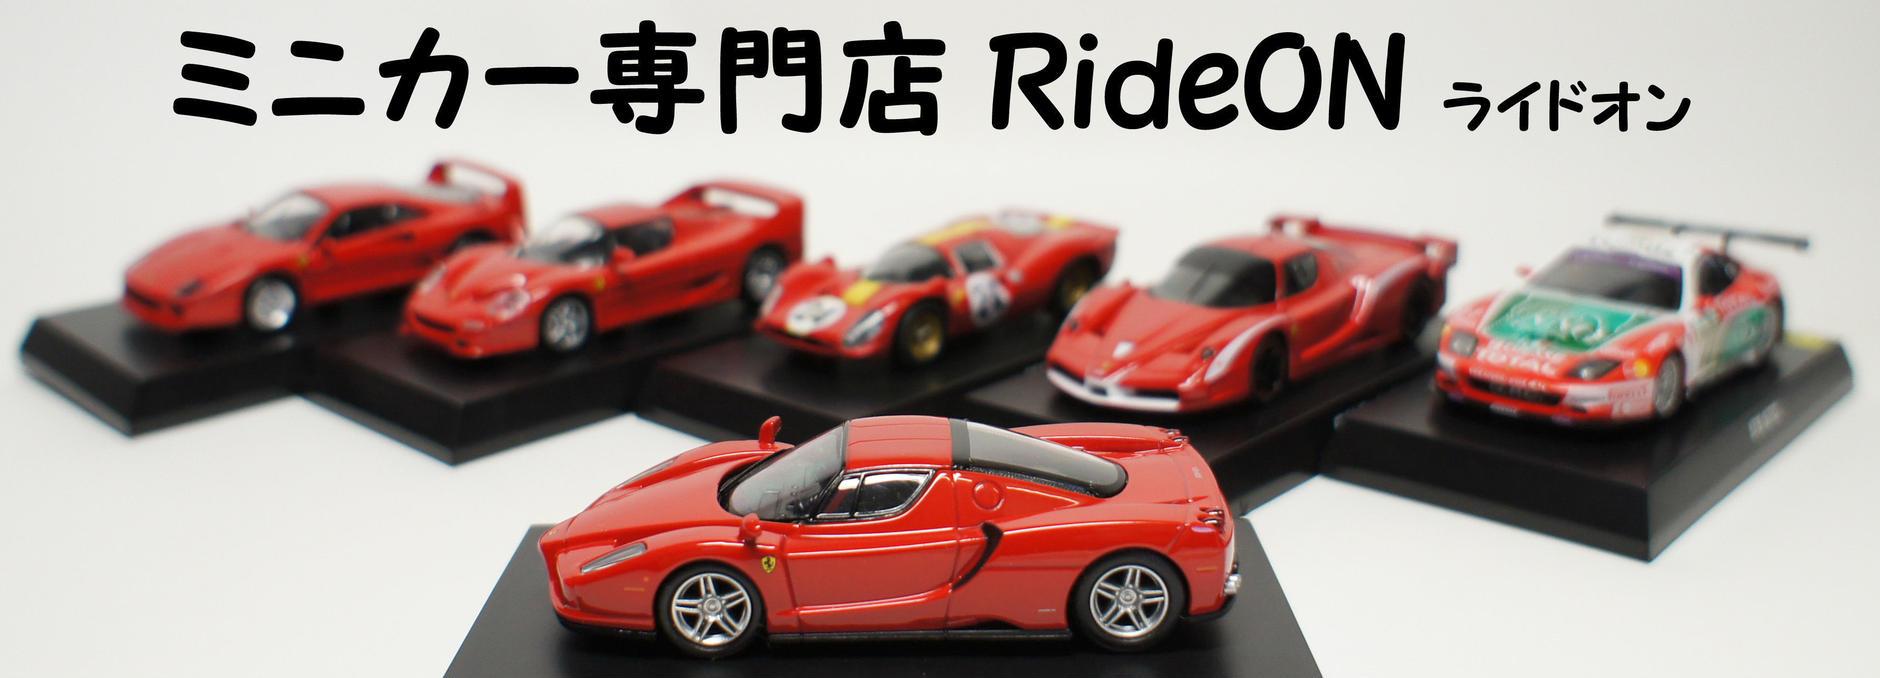 minicar RideON